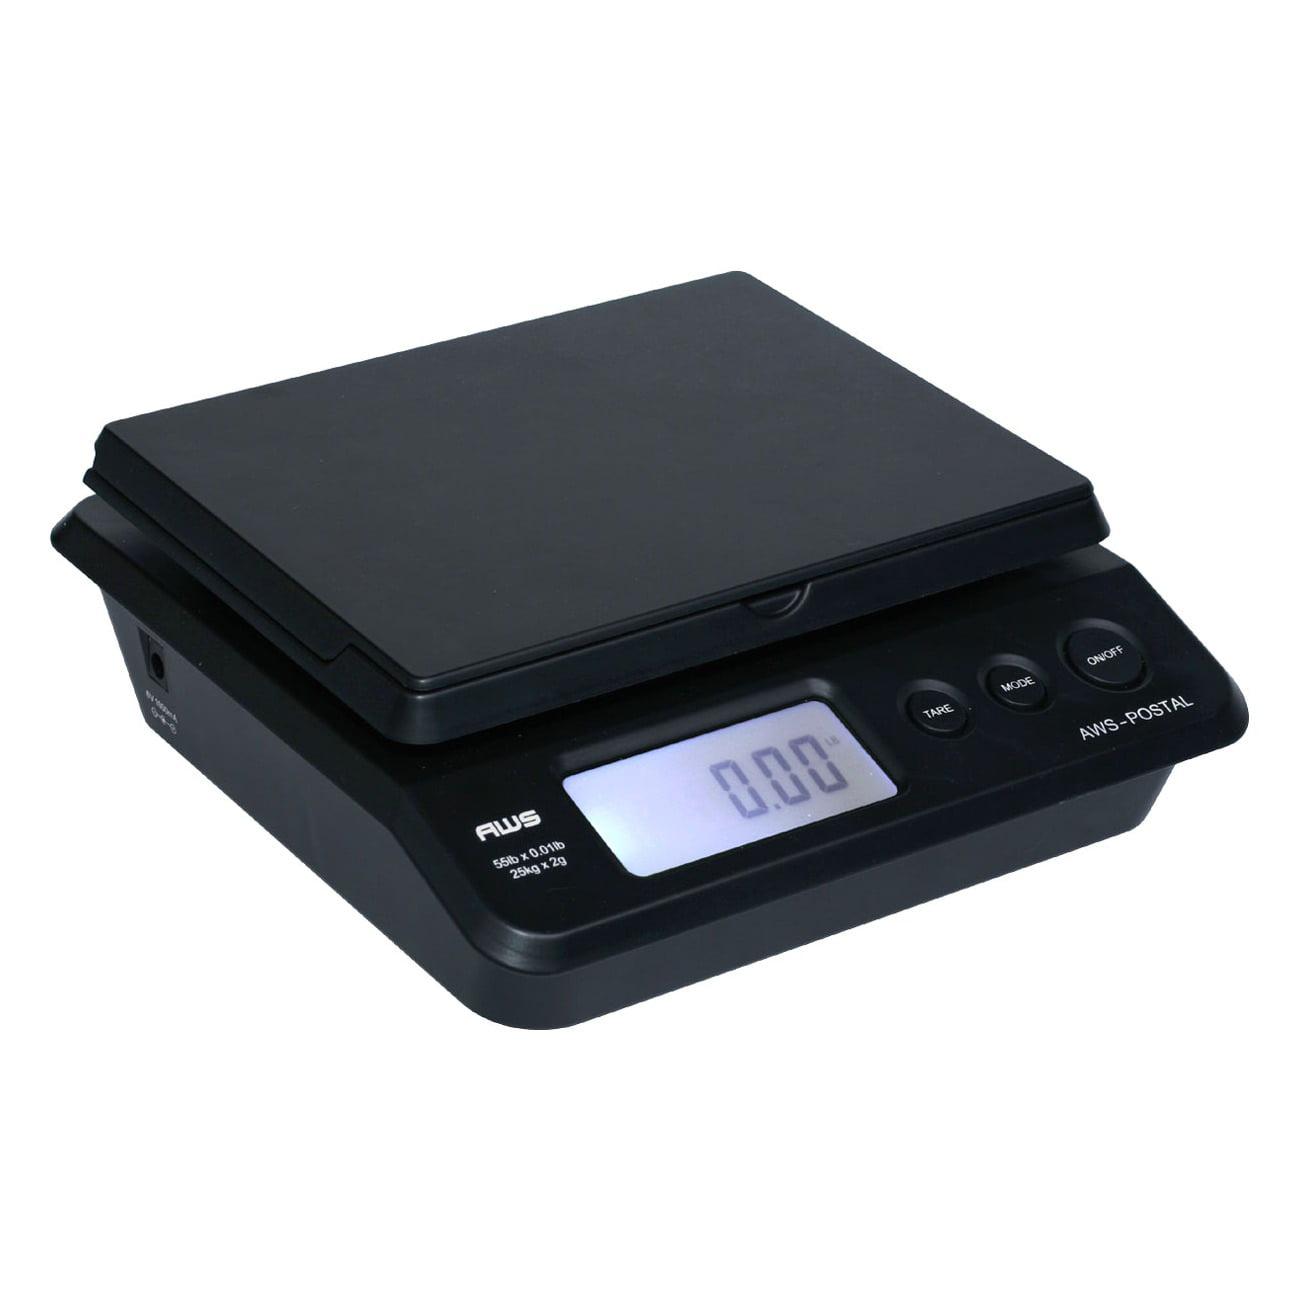 Black Accuteck ShipPro 110lbs x 0.1 oz Digital Shipping Postal Scale